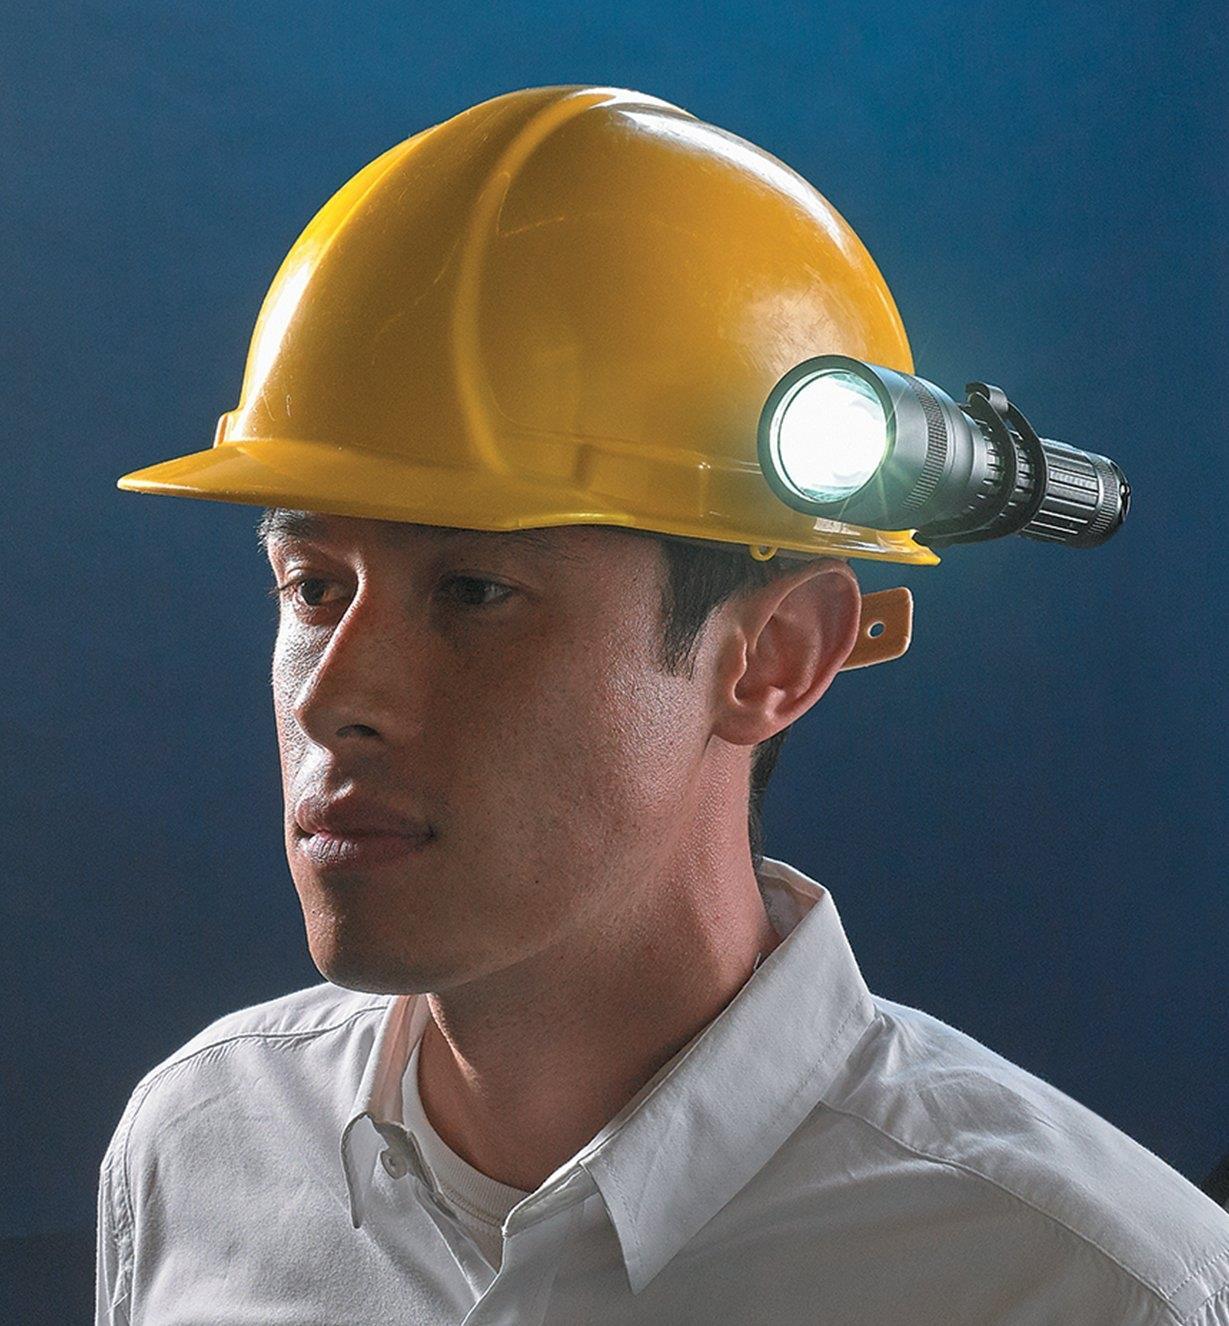 45K1980 - Hard-hat Mount for Suprabeam Q7 Flashlights